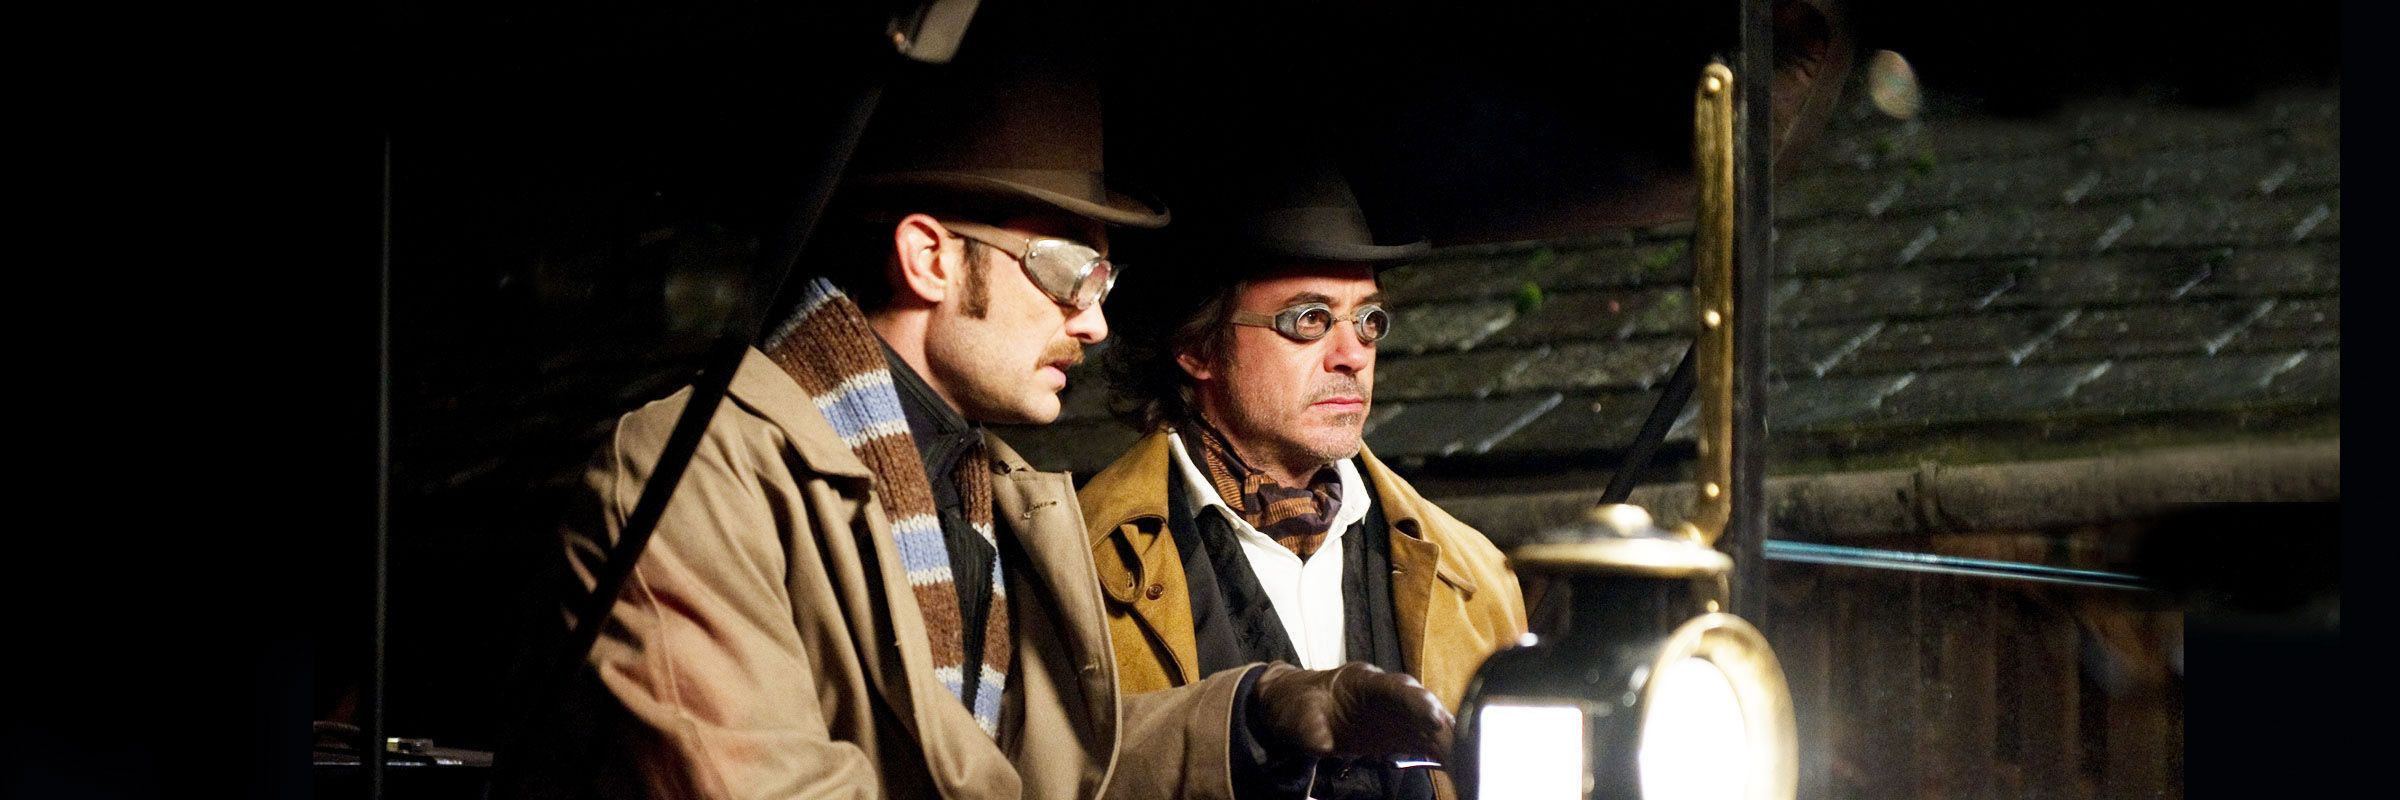 Sherlock Holmes: A Game of Shadows | Full Movie | Movies